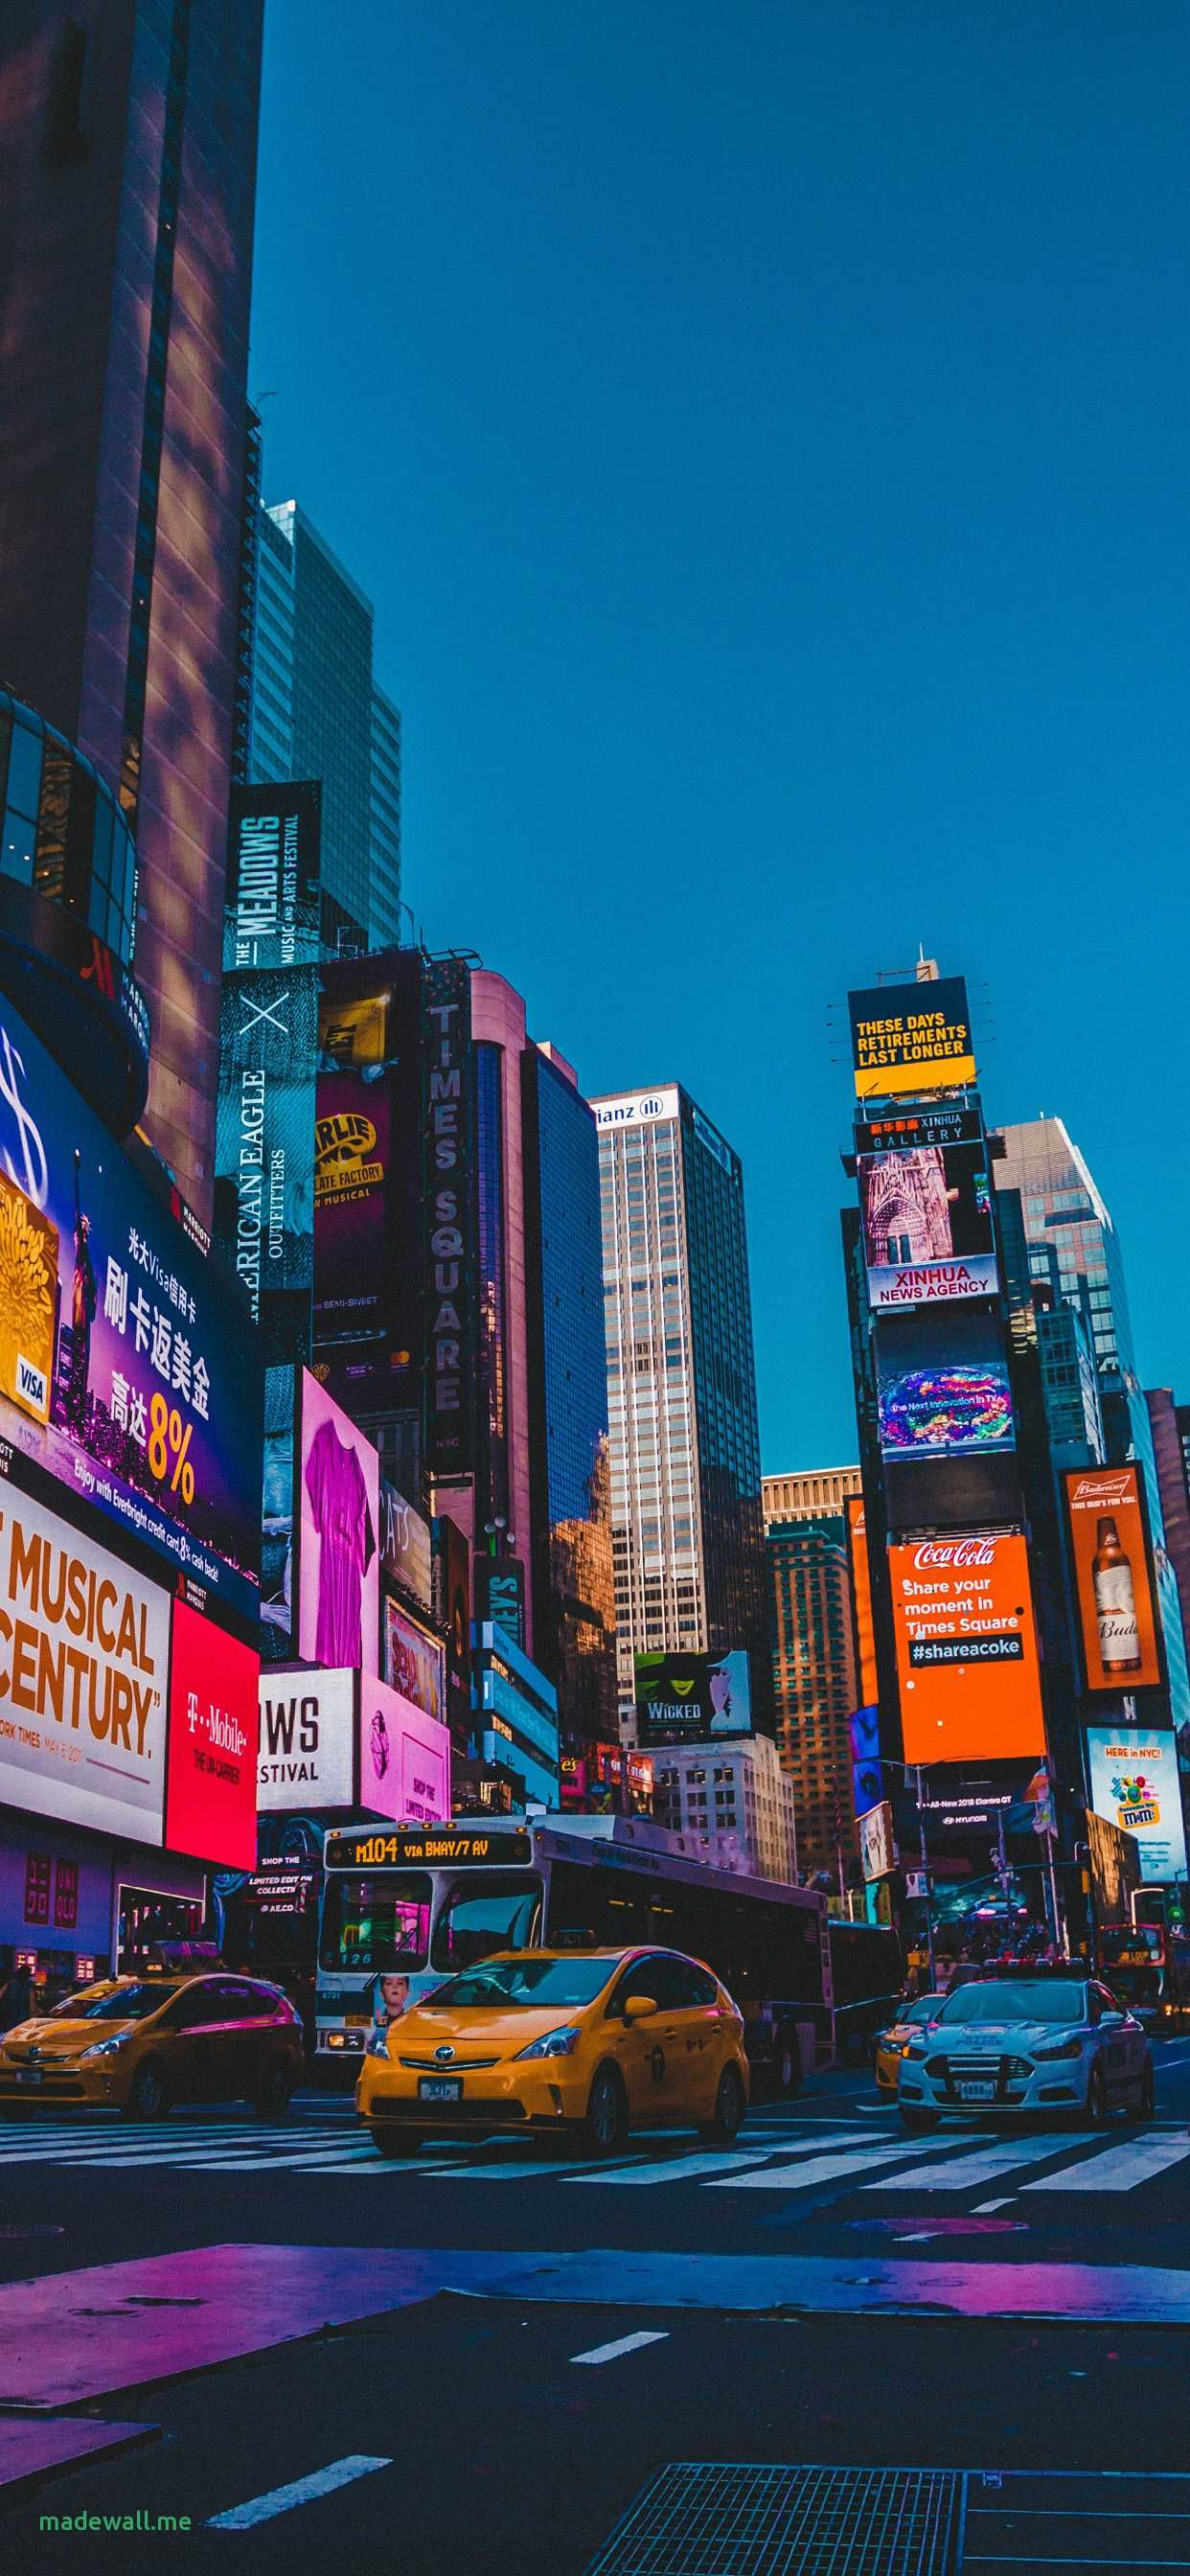 15 Lindos fondos de pantalla estilo Tumblr para personalizar tu celular